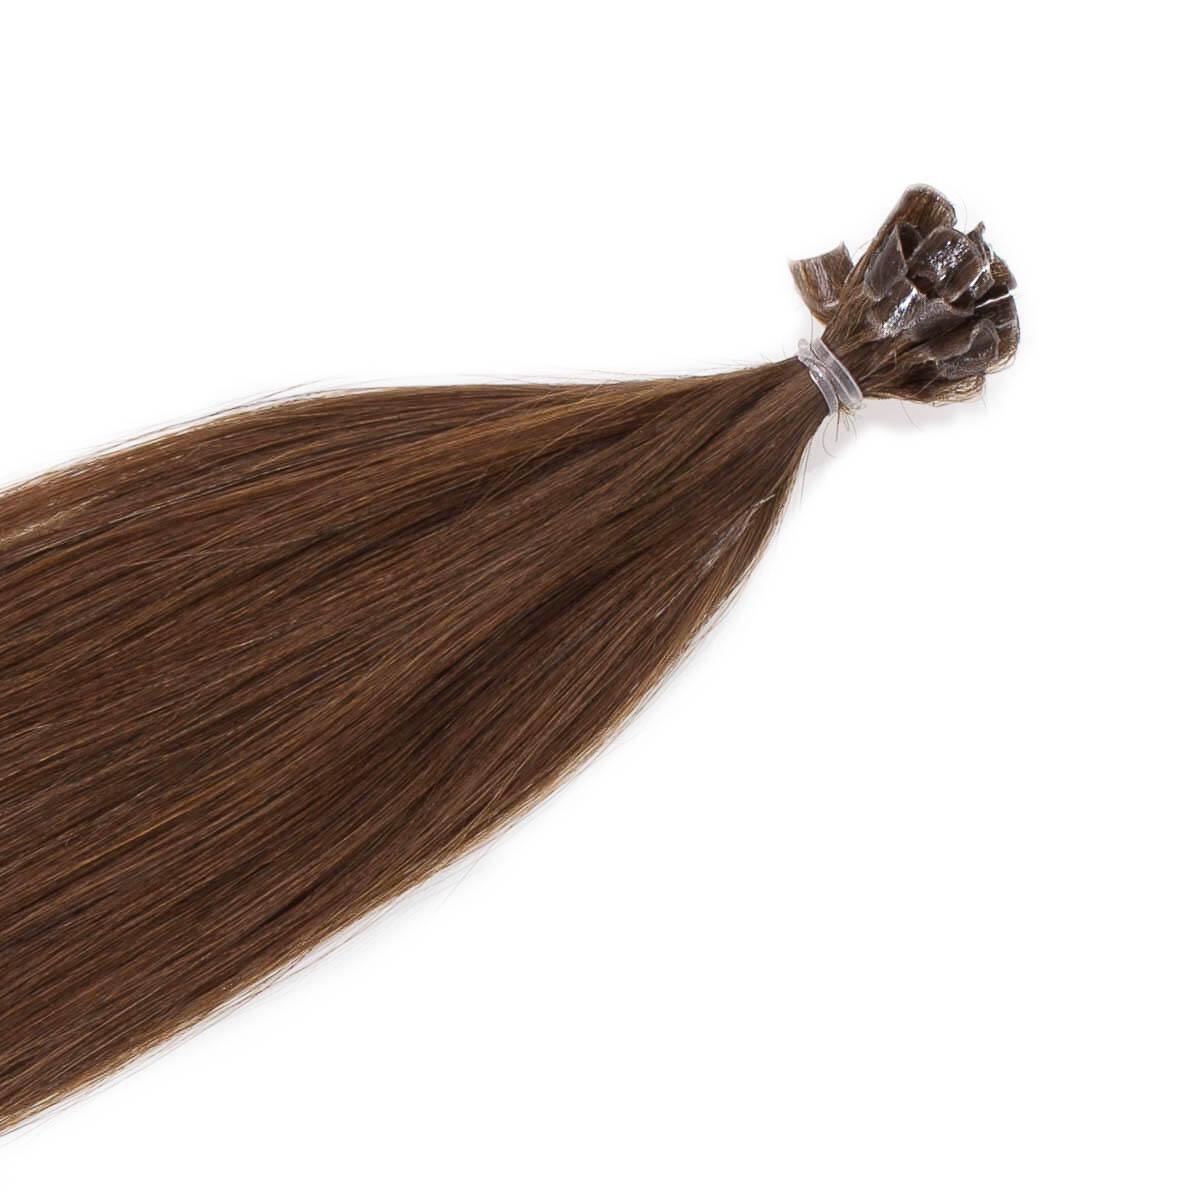 Nail Hair Original 5.0 Brown 70 cm